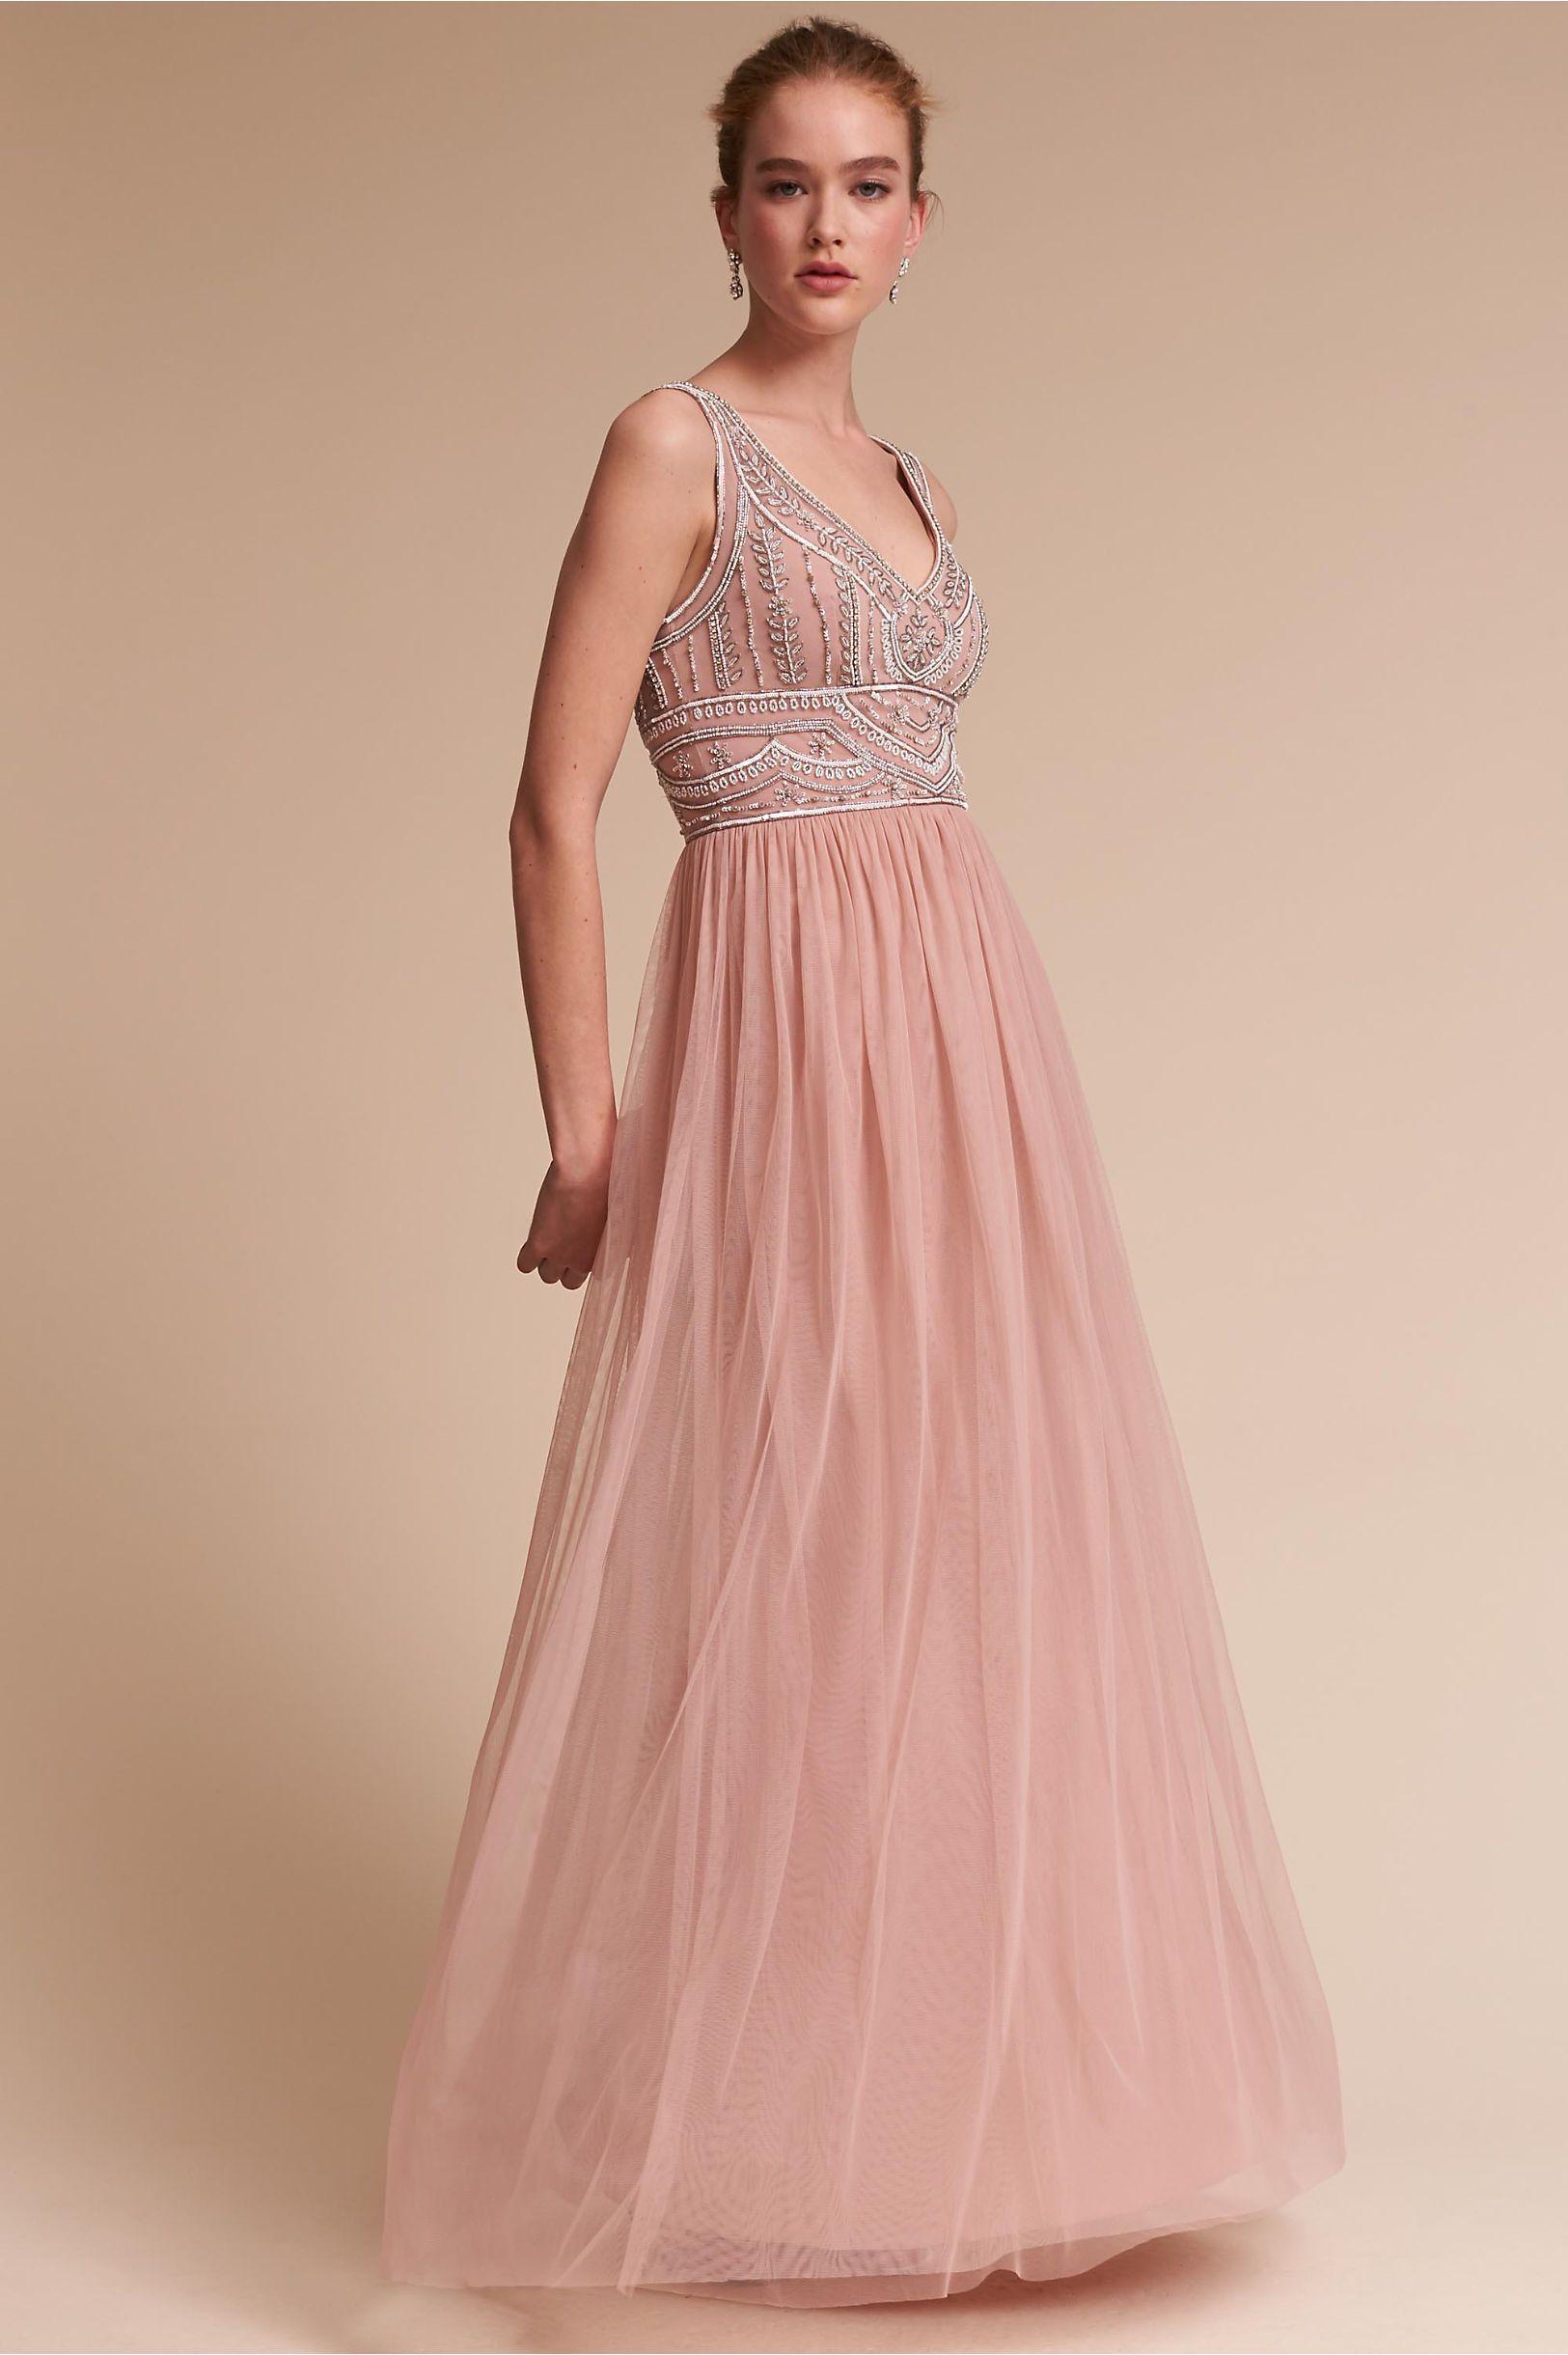 BHLDN Iris Sterling Dress in Bridal Party | BHLDN | A KASSAN WEDDING ...